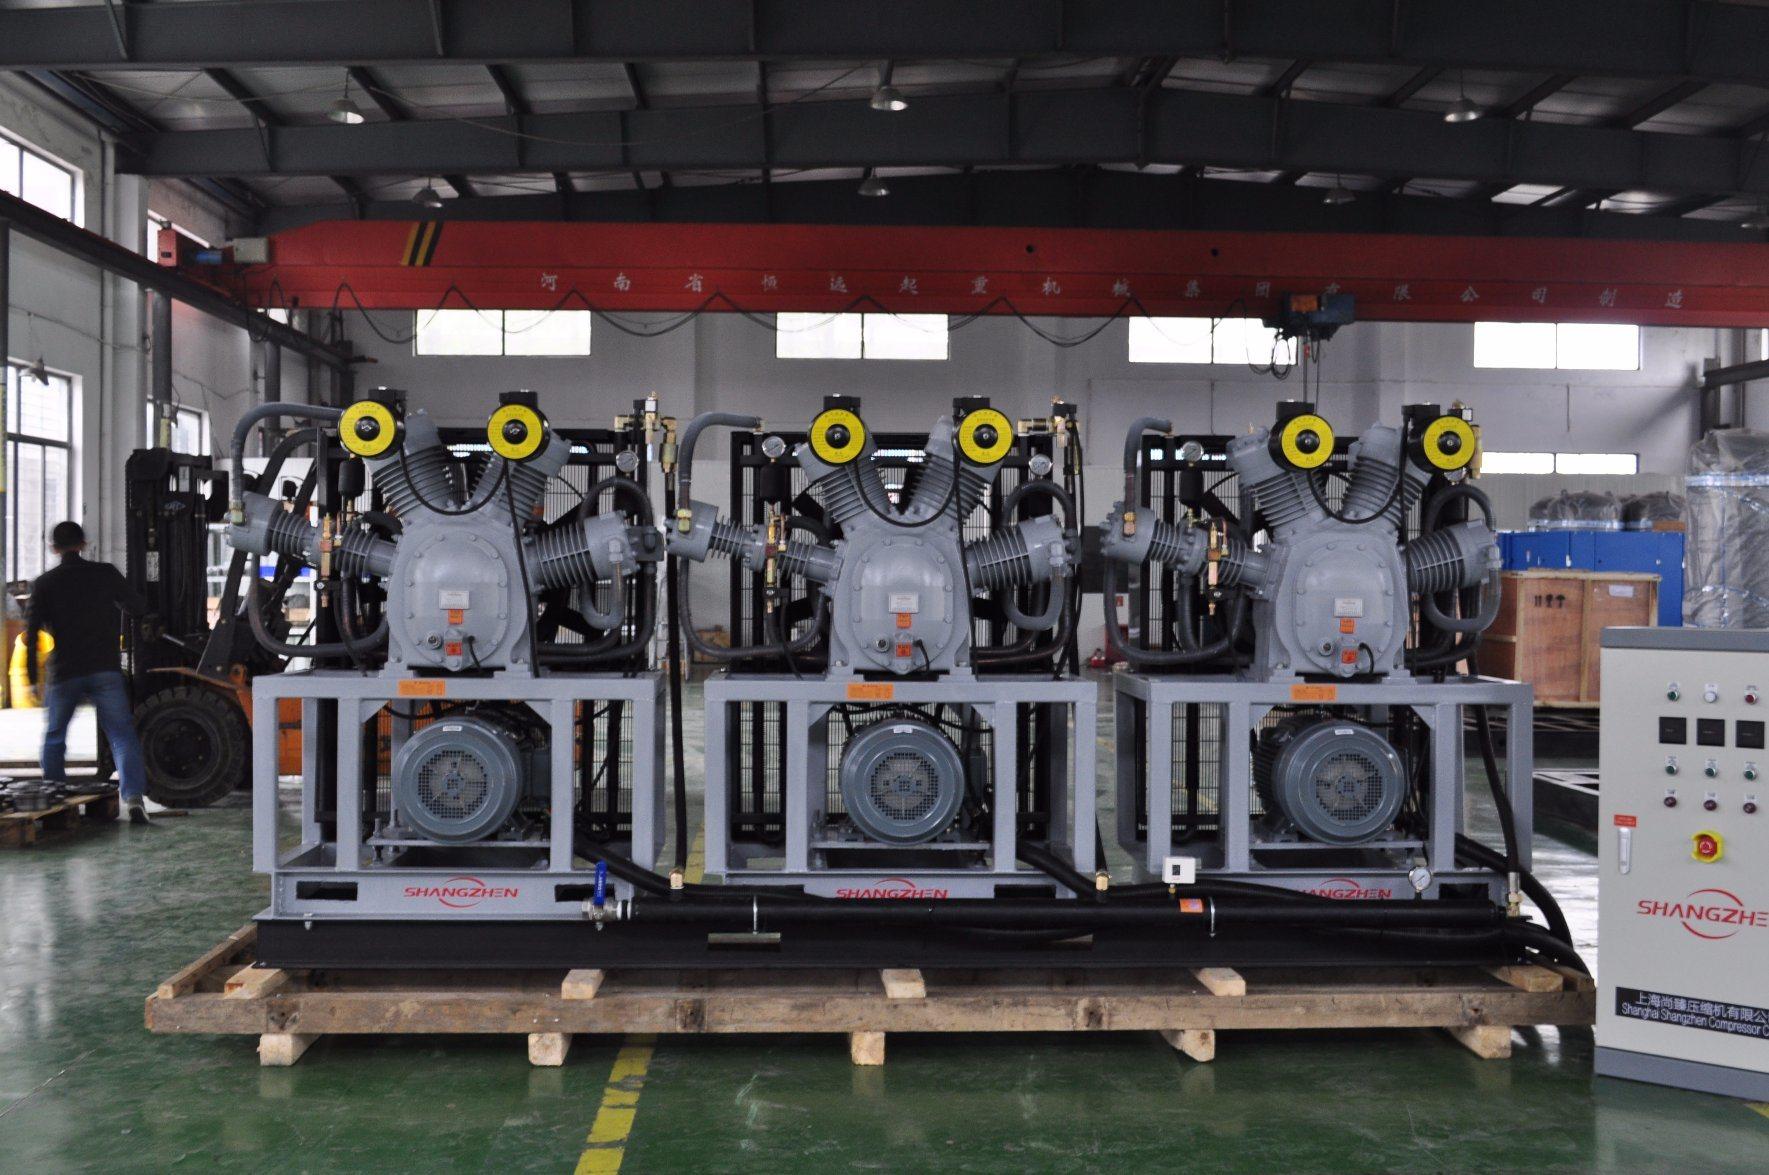 3-Sh-6/40 6.0m3/Min 30bar 35bar 40bar Pet Bottle-Blowing Air Compressor Medium- High Pressure Air Compressor